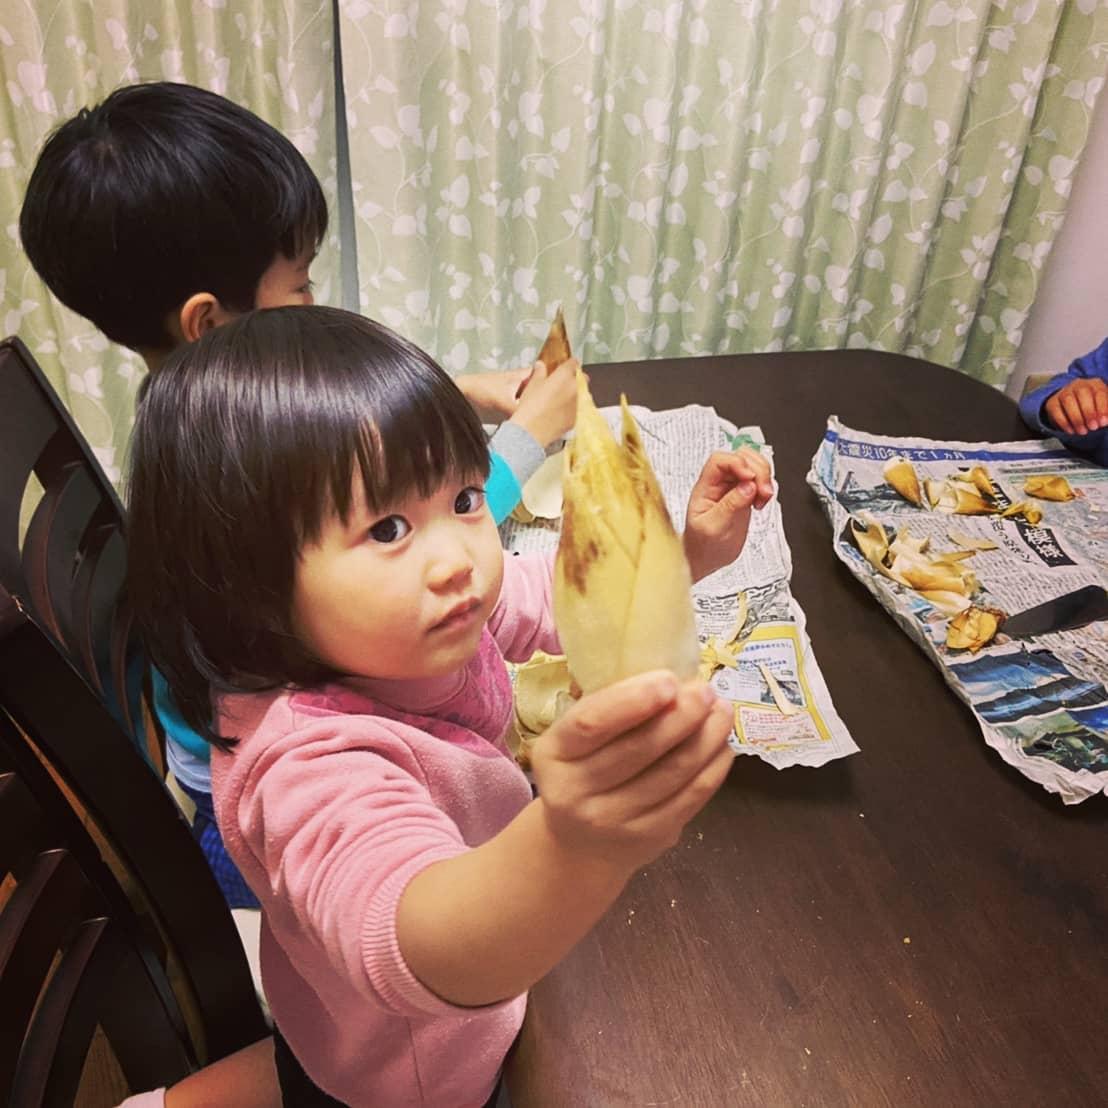 This is Takenokohime.これは筍姫です#阿波たけのこ農園 #筍姫 #たけのこ